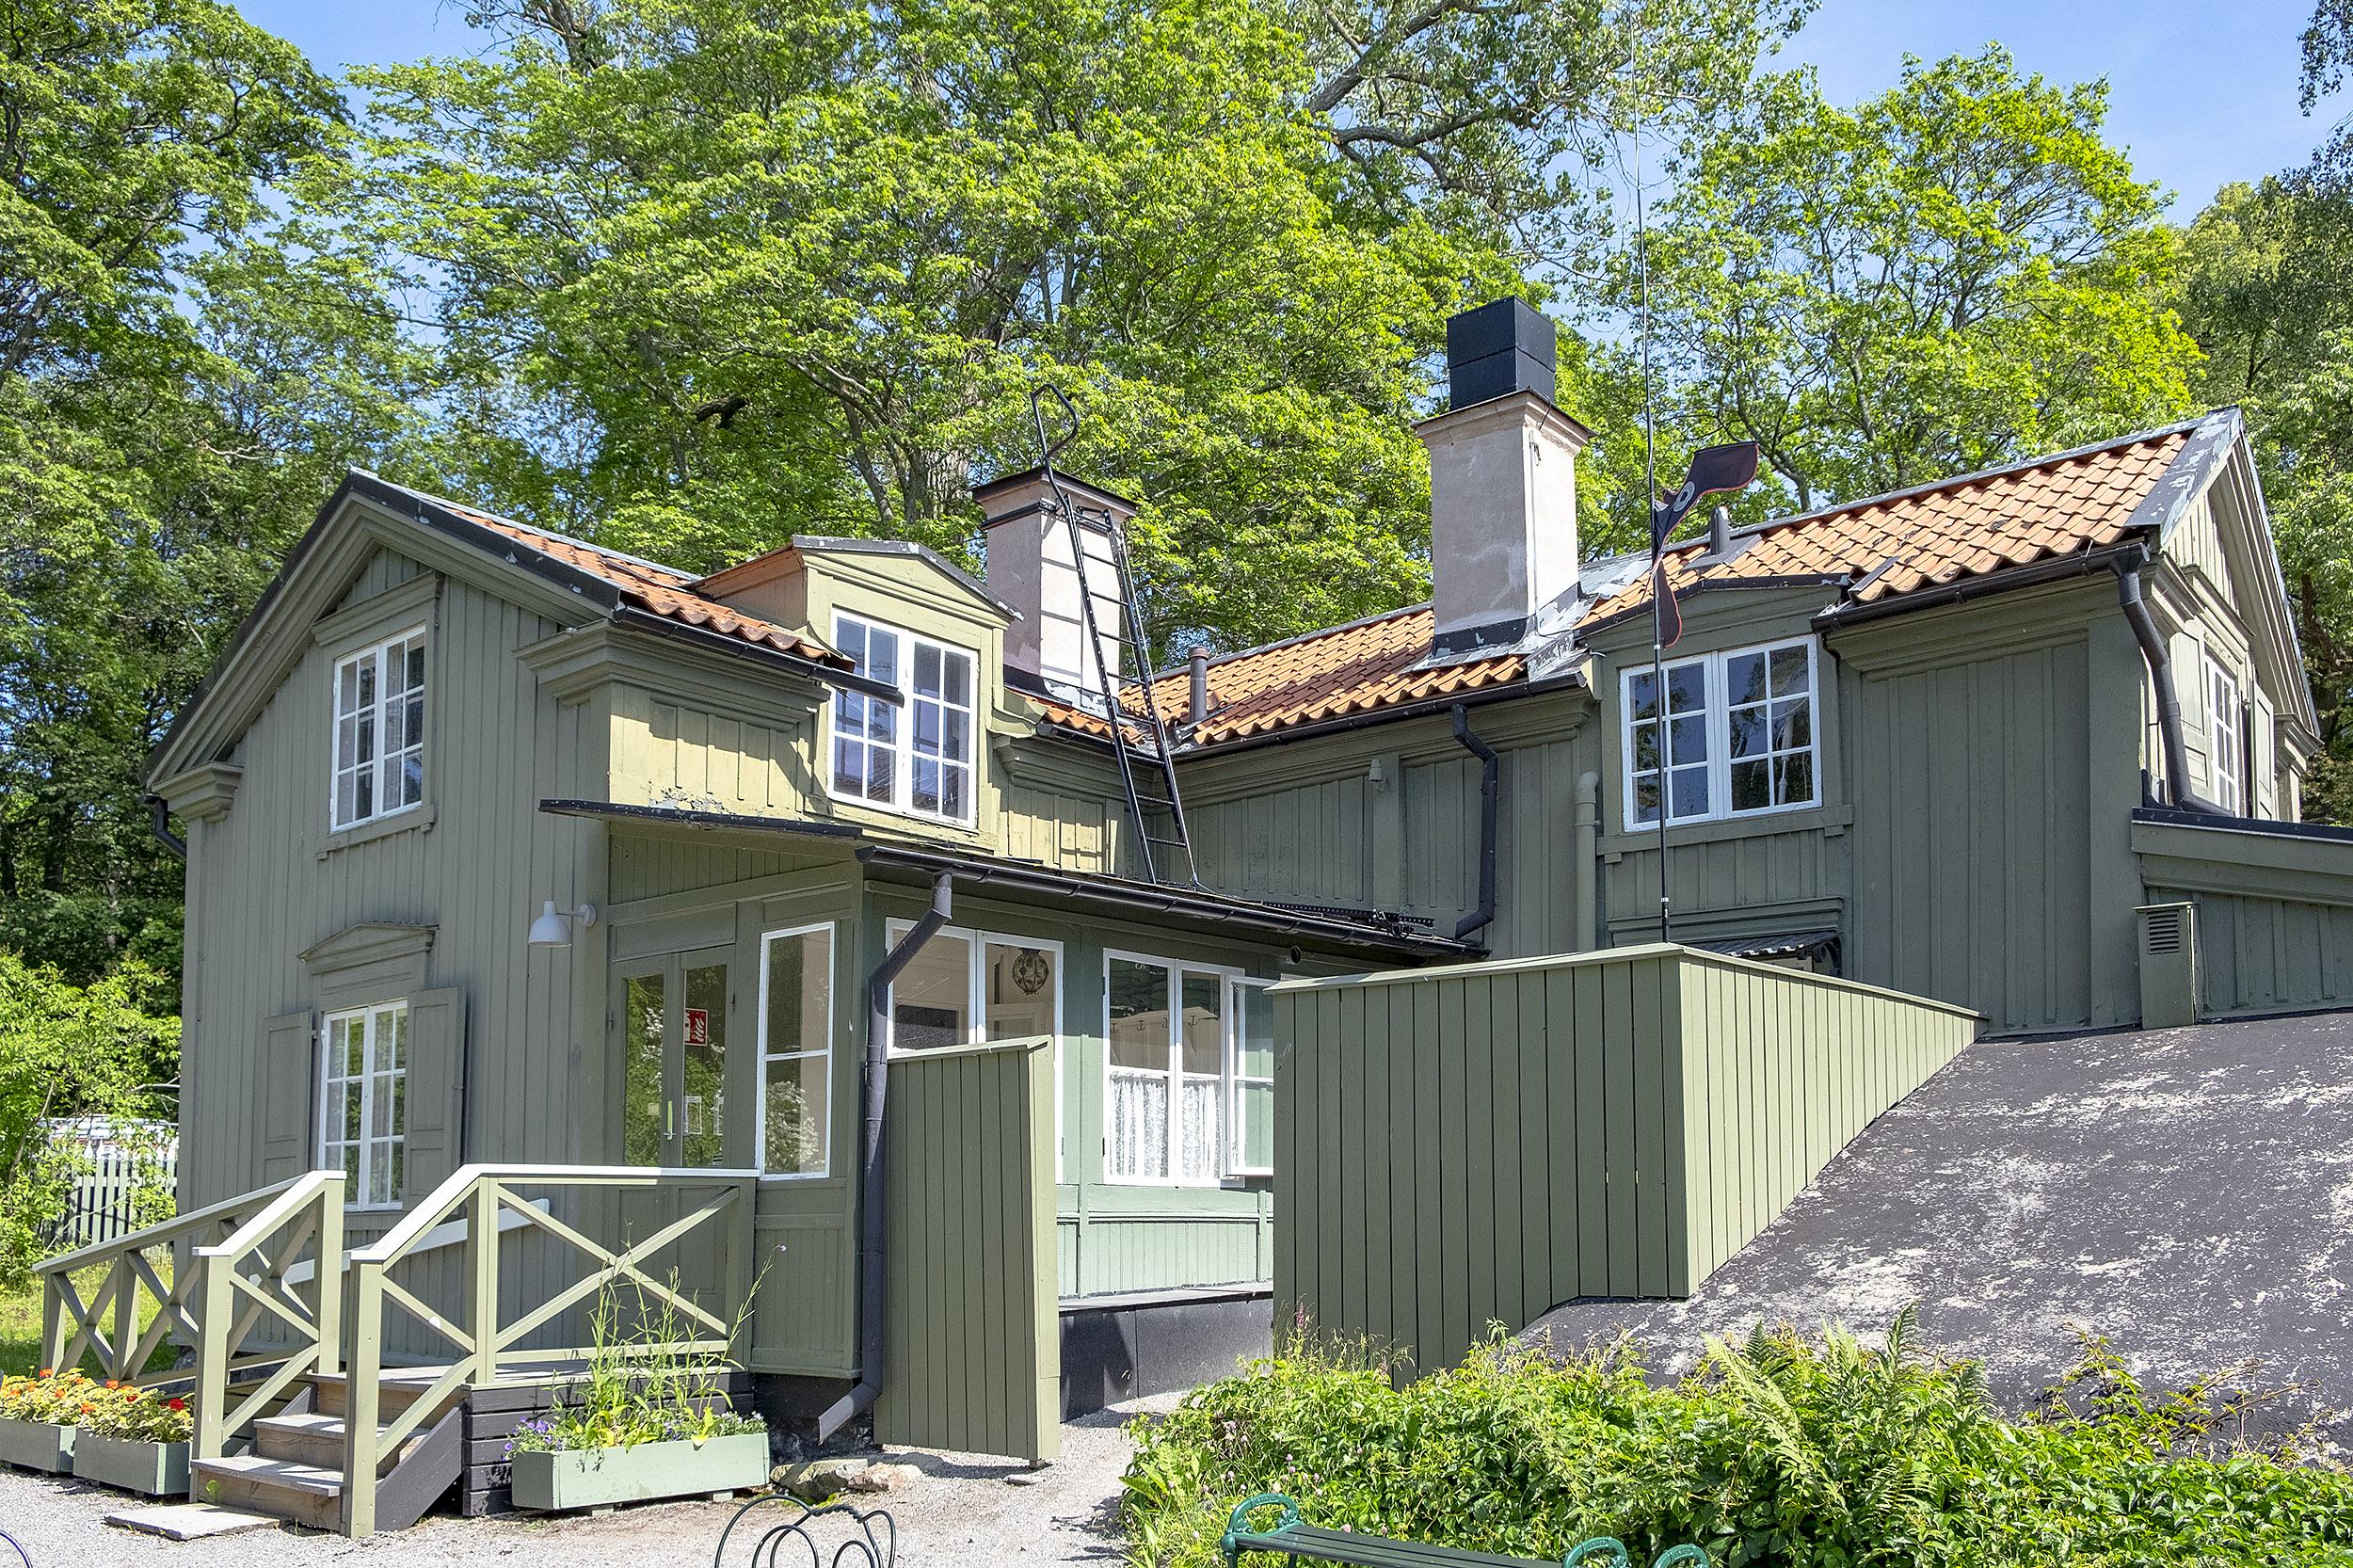 Waldemarsudde Café Ektorpet